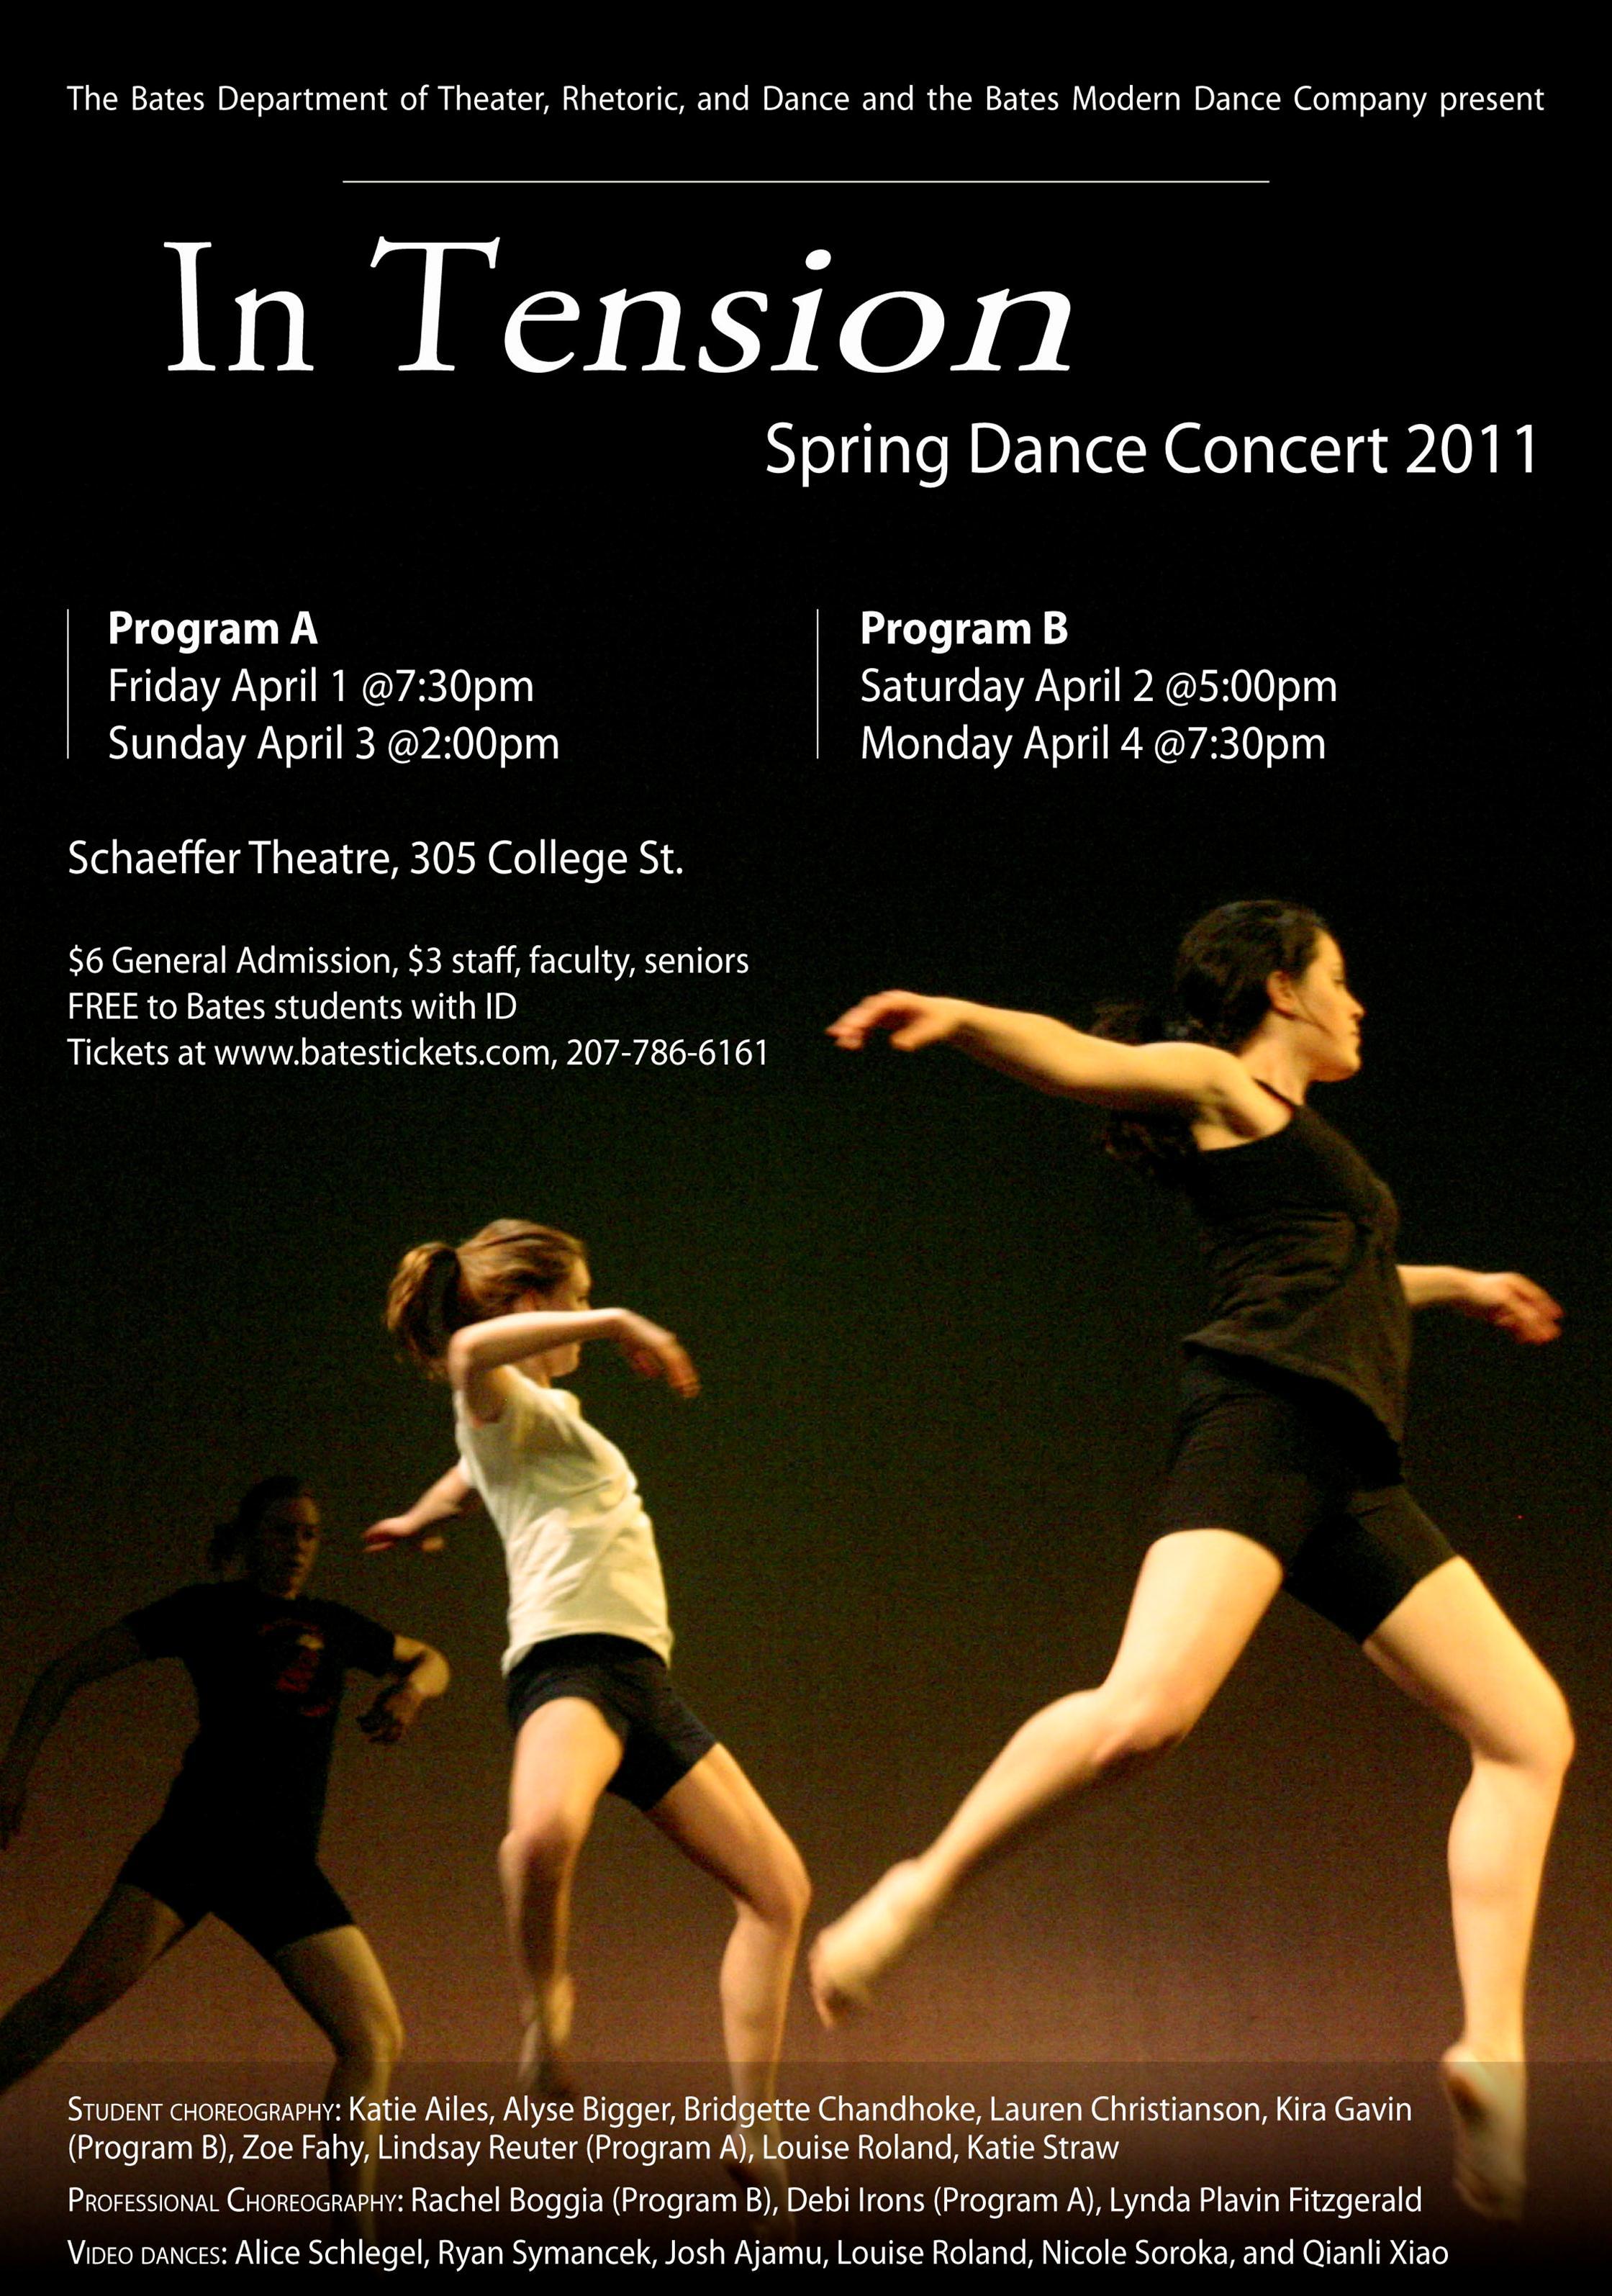 Spring Dance Concert '11